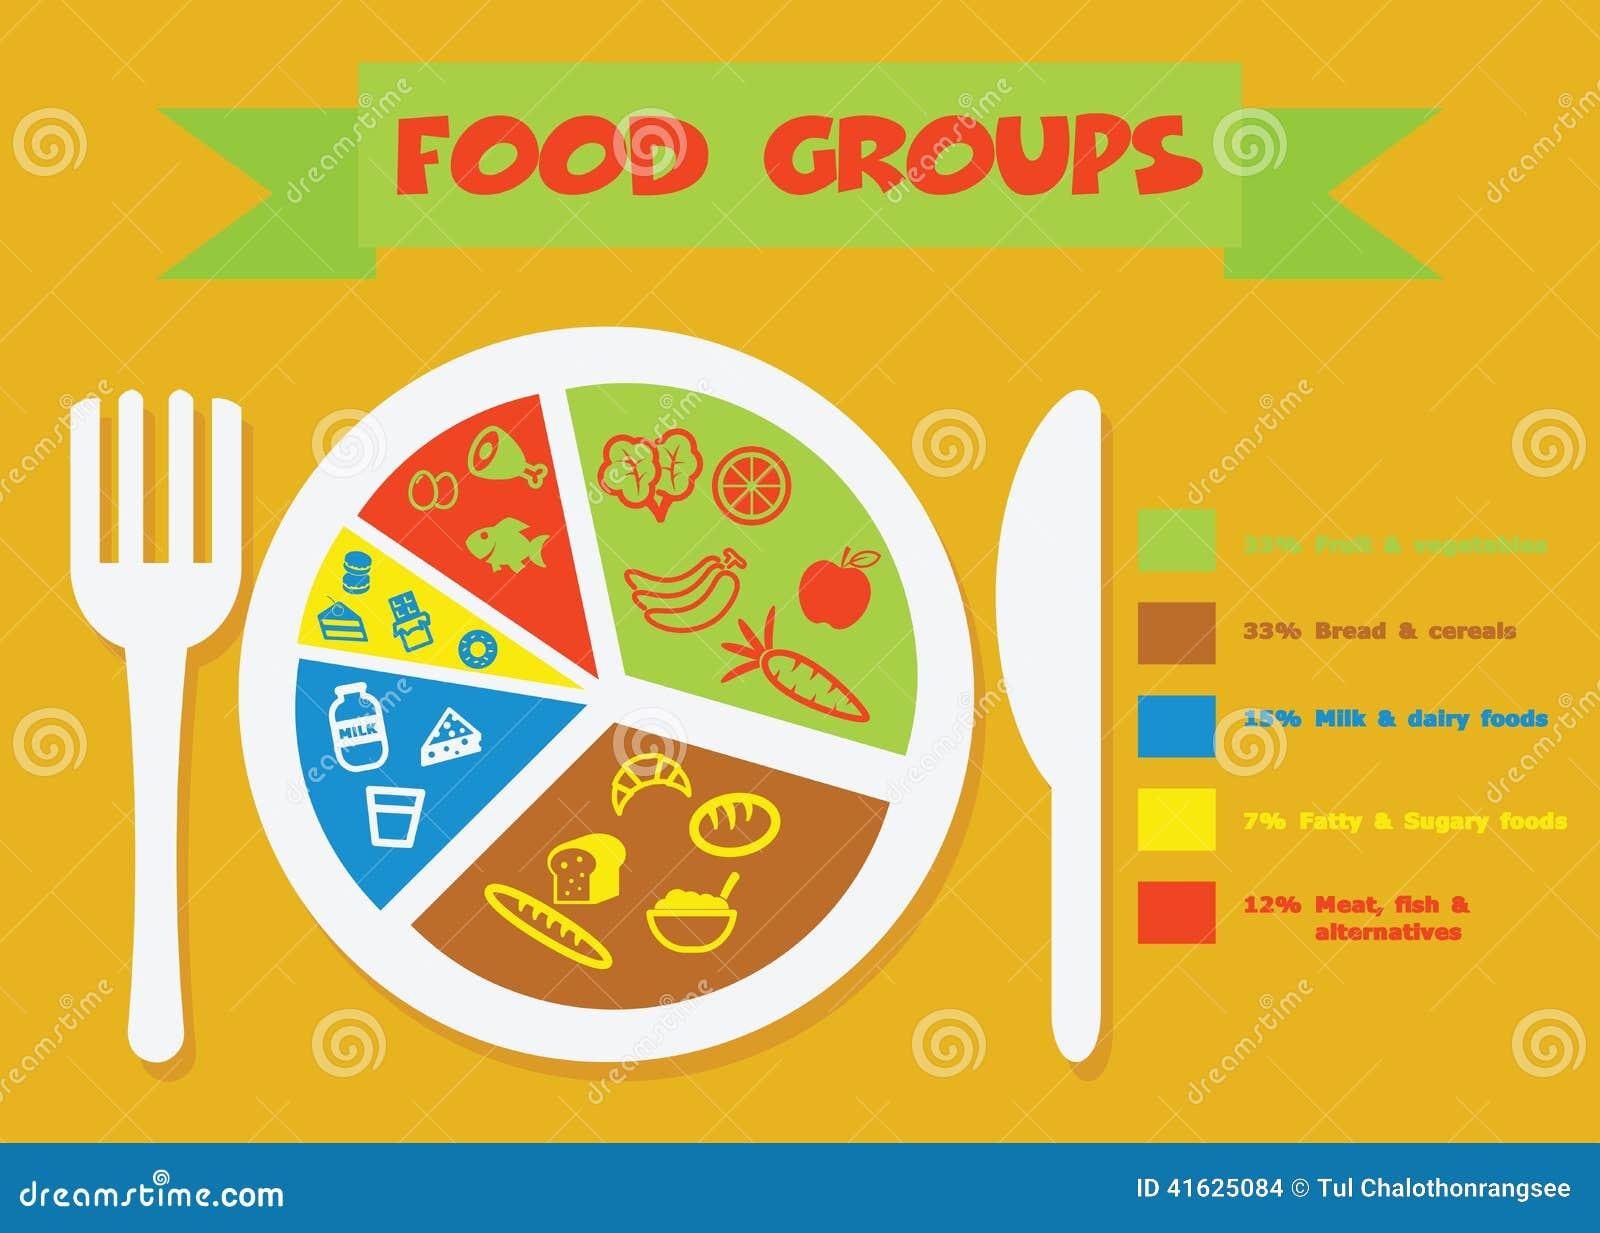 Food Groups Stock Illustration - Image: 52705889